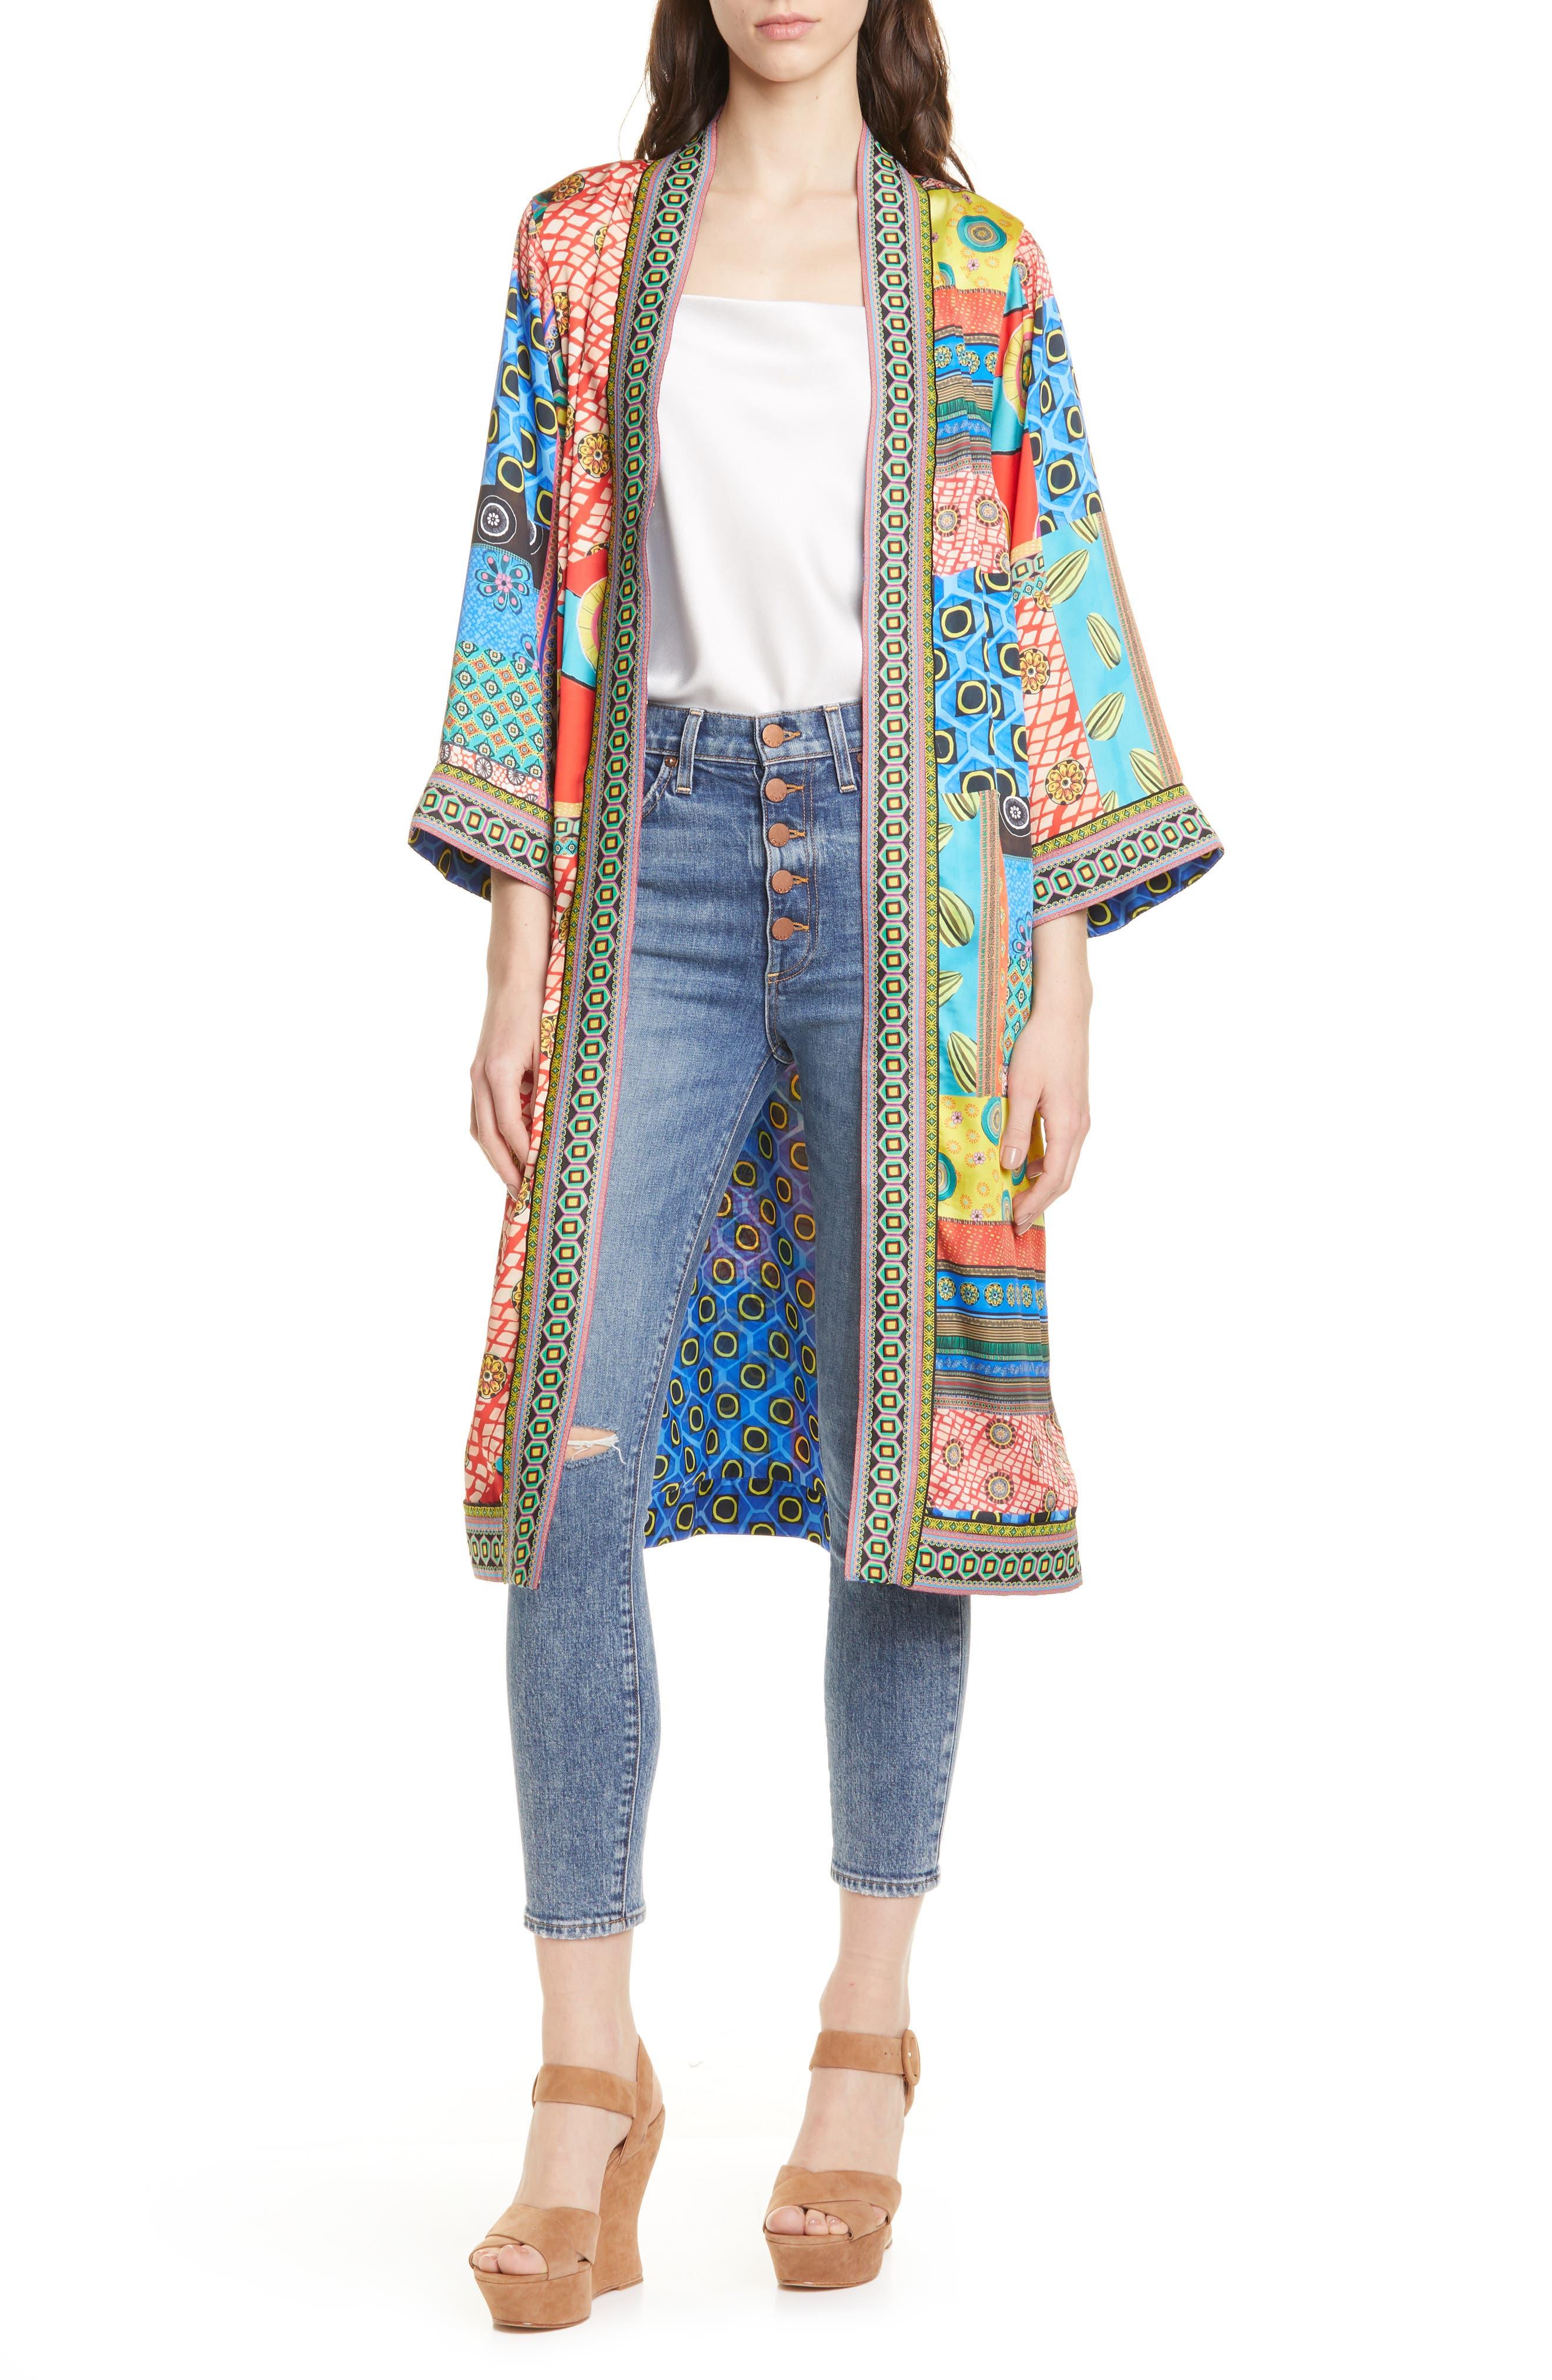 Women's Clothing Supply Women 2018 Vintage Retro Floral Print Green Color Long Design Kimono Coat Jacket Long Sleeve Cardigan Maxi Shawl Tops